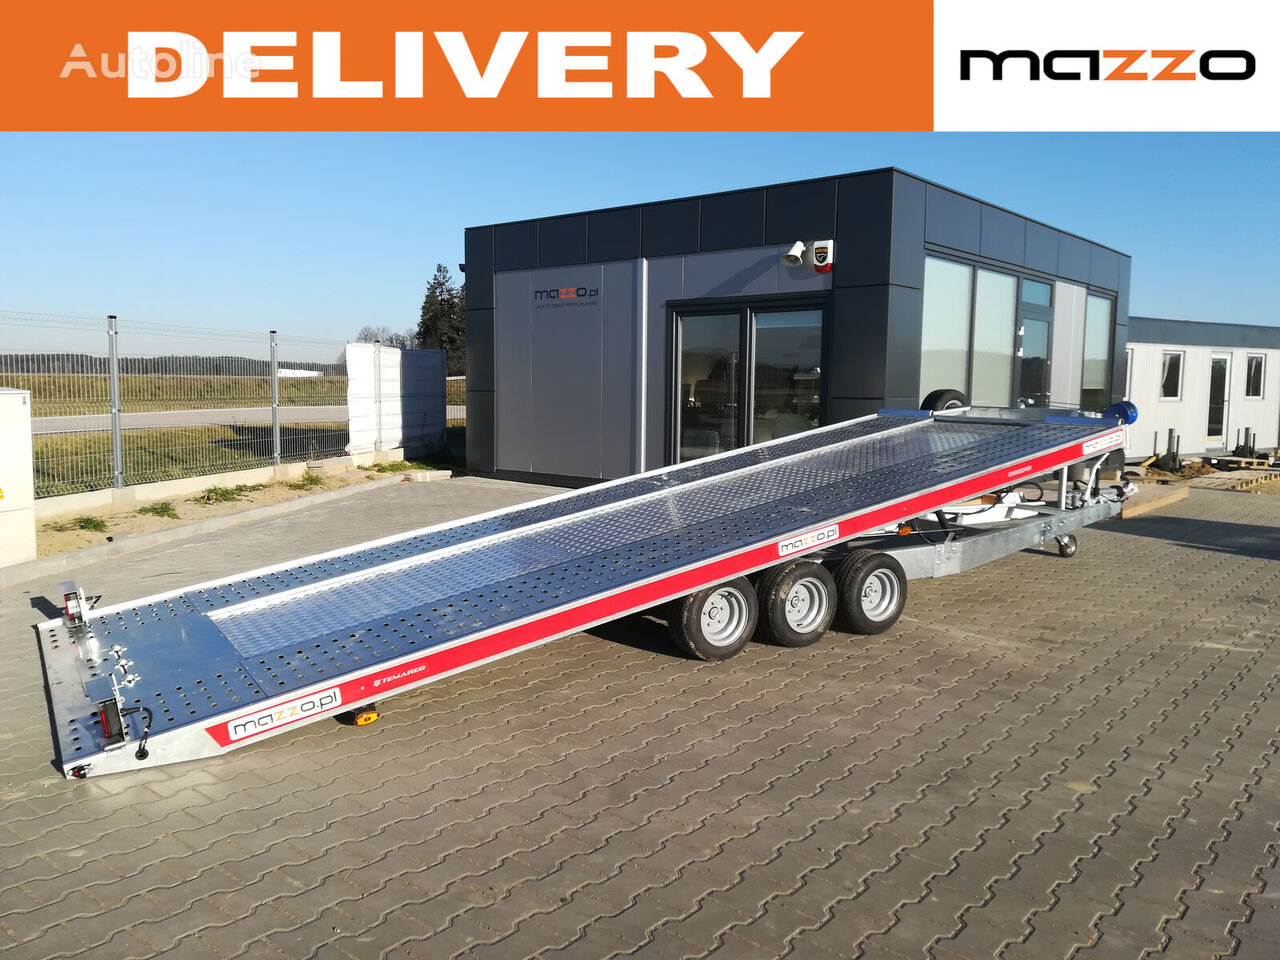 nový přívěs autotransportér 4820/3 480x206 Tilt trailer with hand pump!